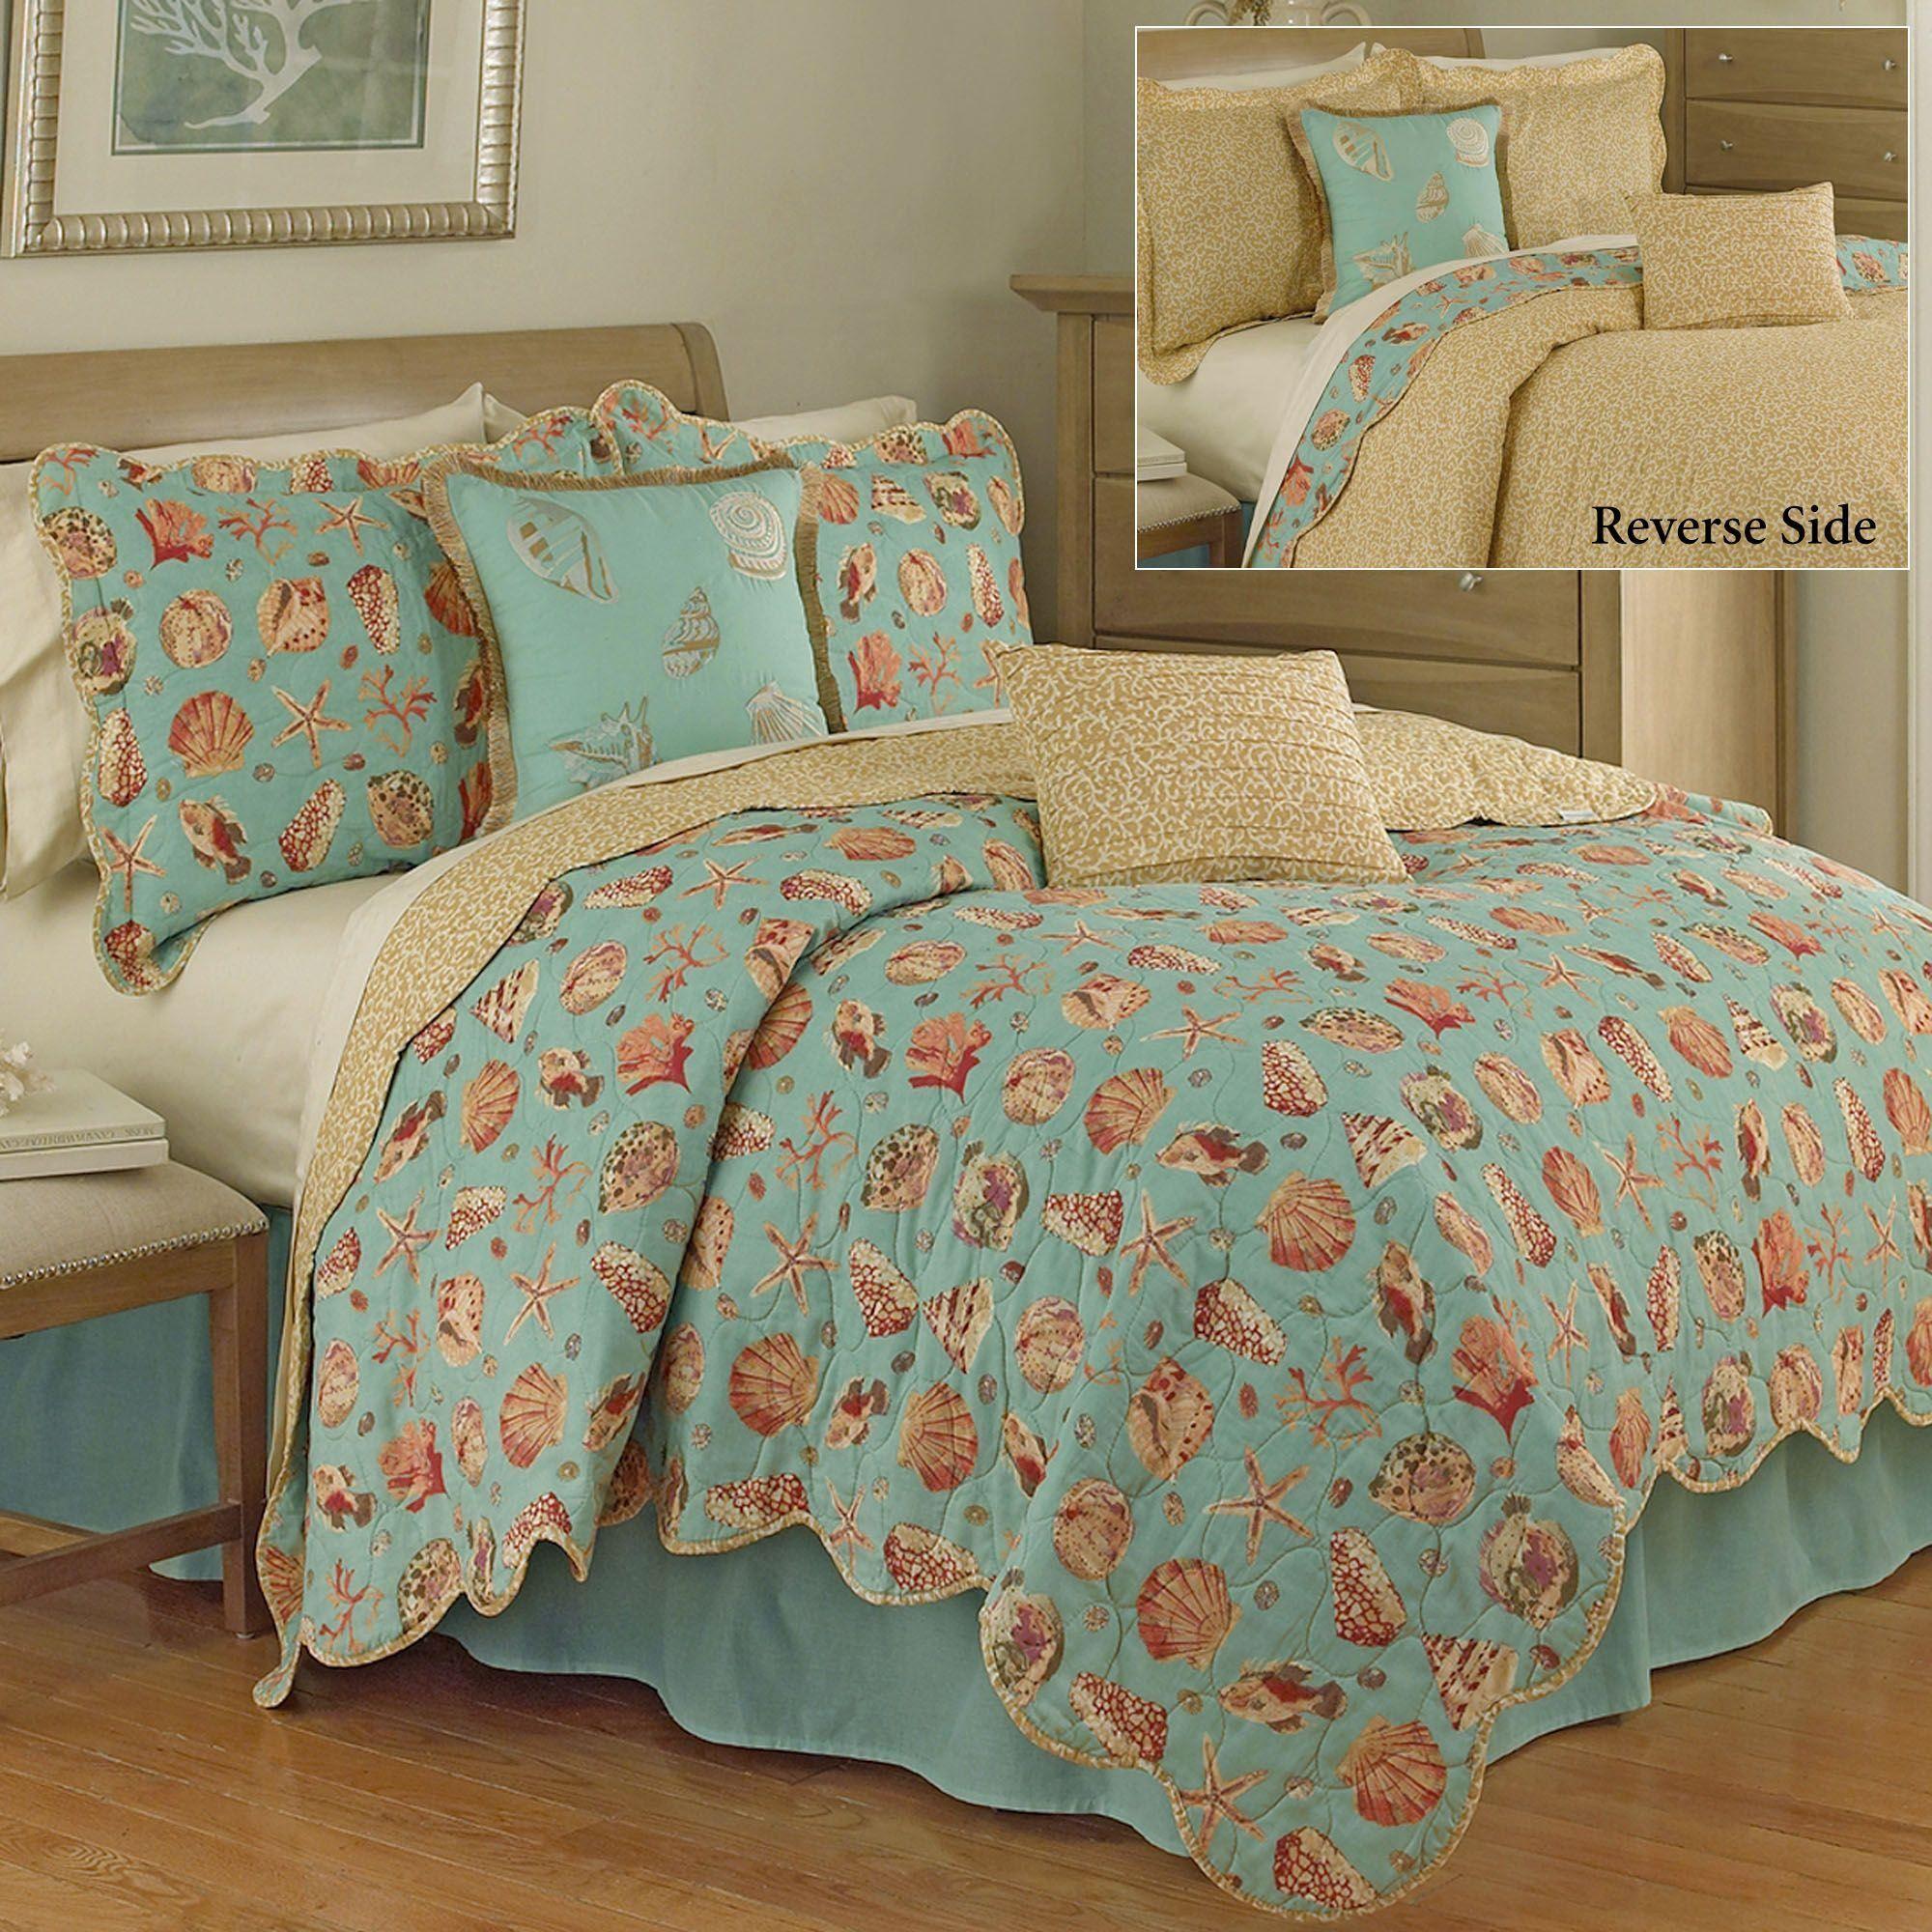 database ideas disney waverly quilt quilting remodeling design piece home moana quilts toddler set the deal walmart get bedroom sets bedding